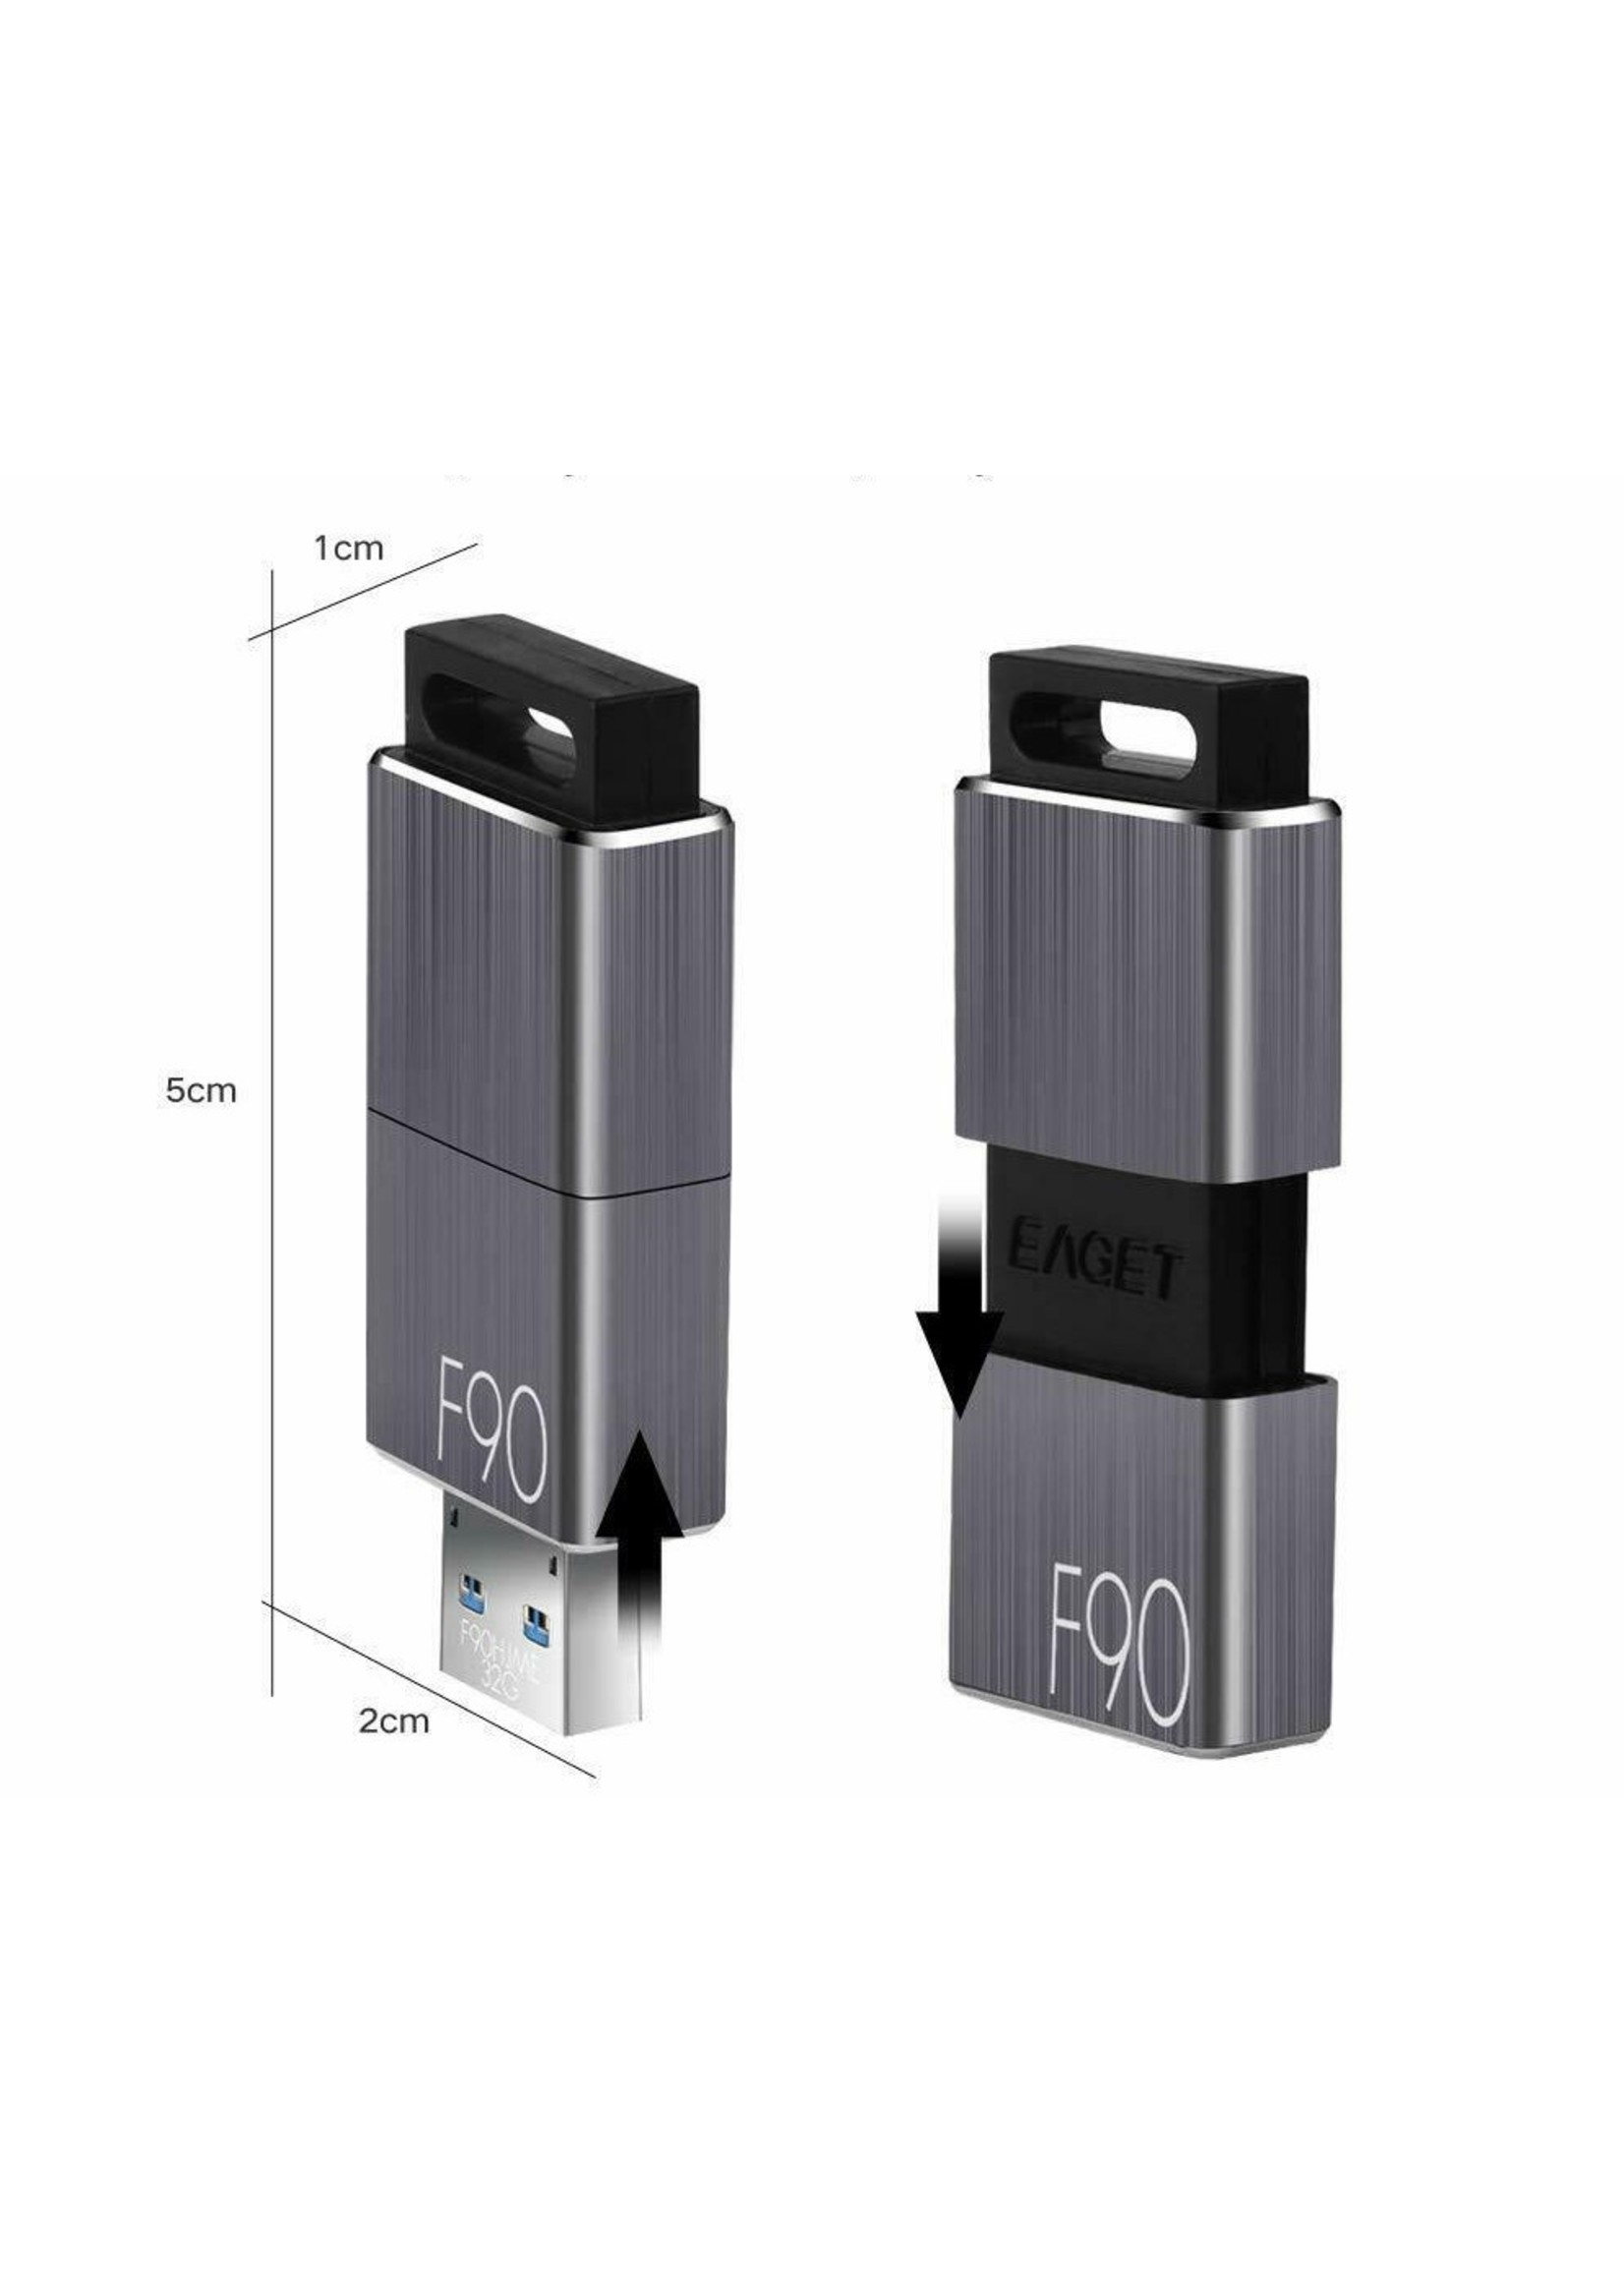 Memory-128 GB Flash Drive USB 3.0 / 3.1